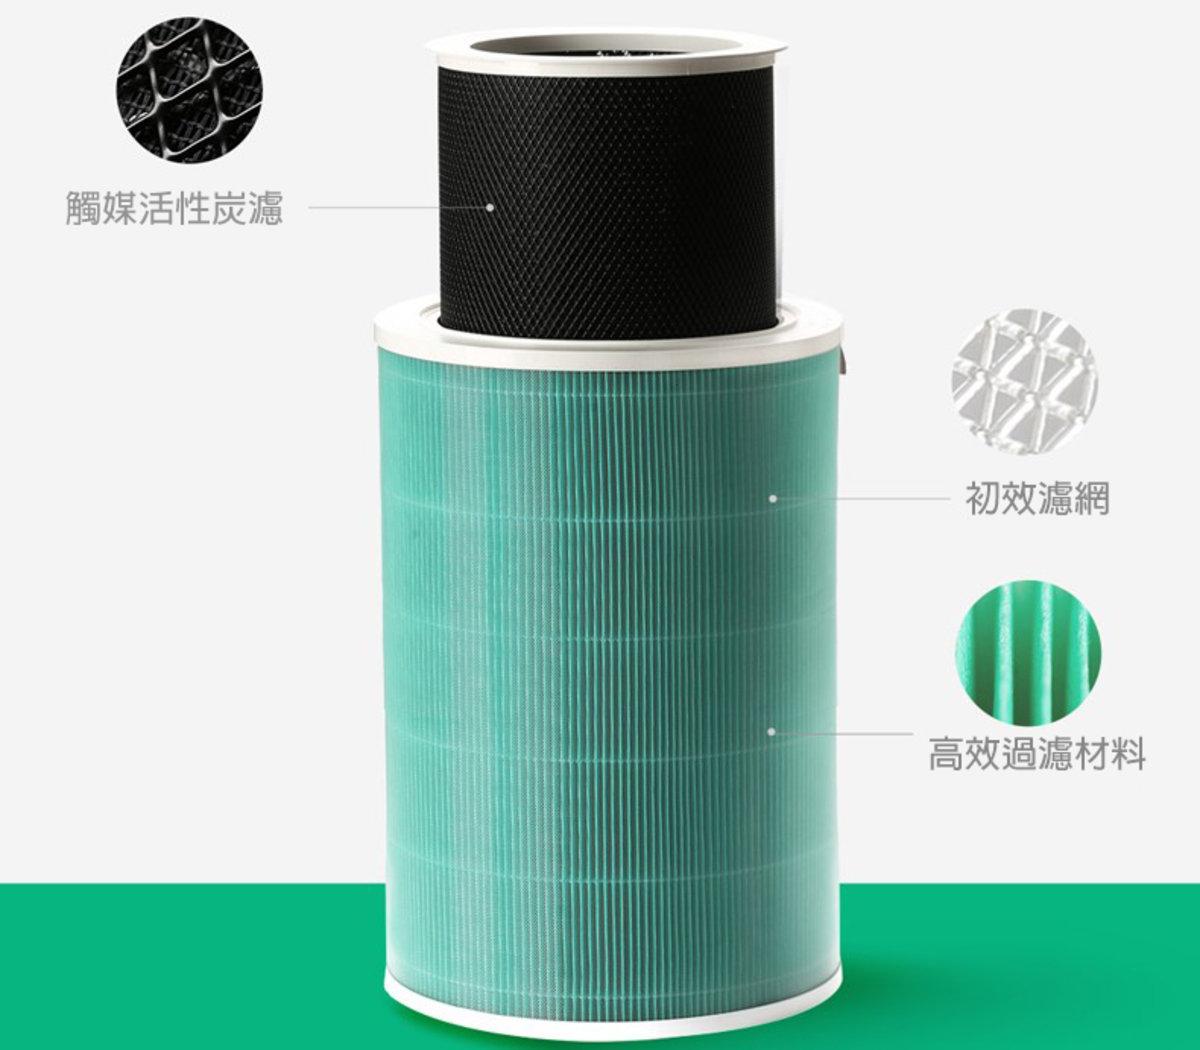 Mi Air Purifier Anti-formaldehyde Filter